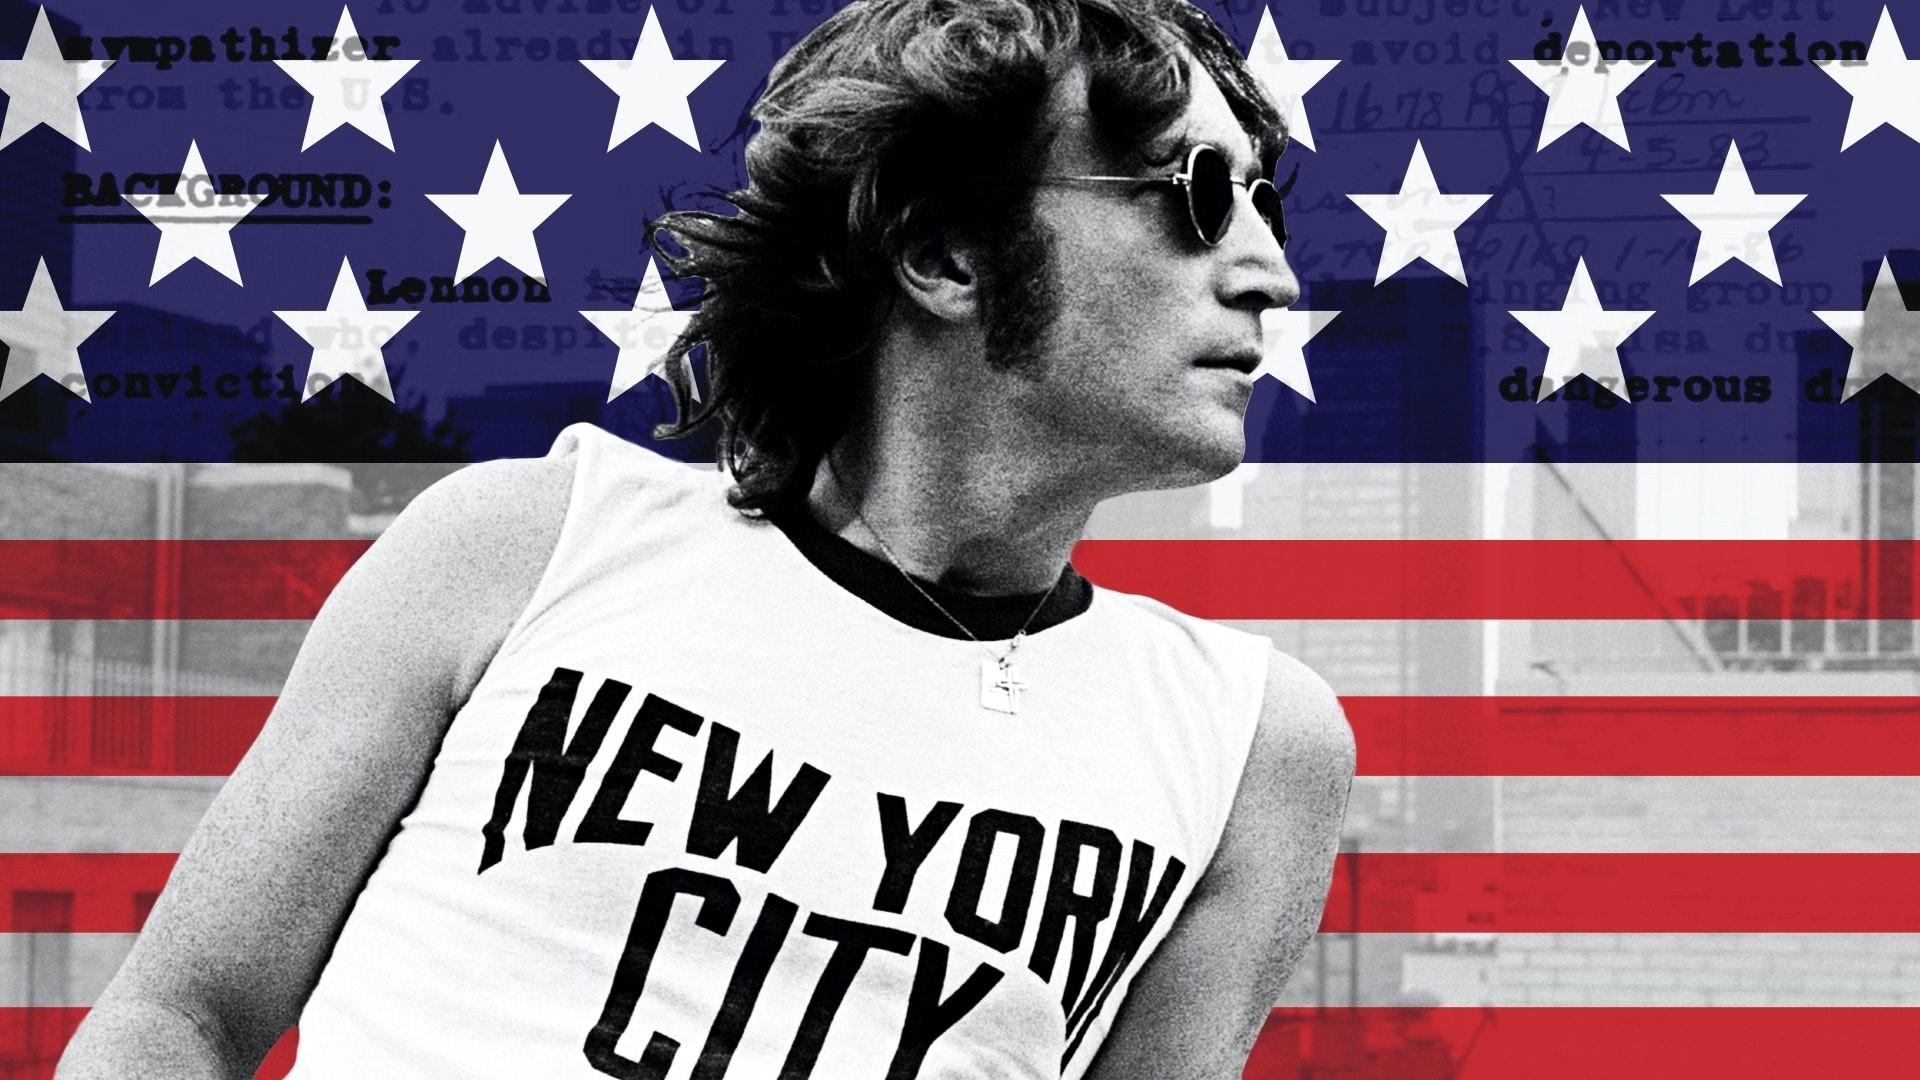 John Lennon Wallpaper Theme